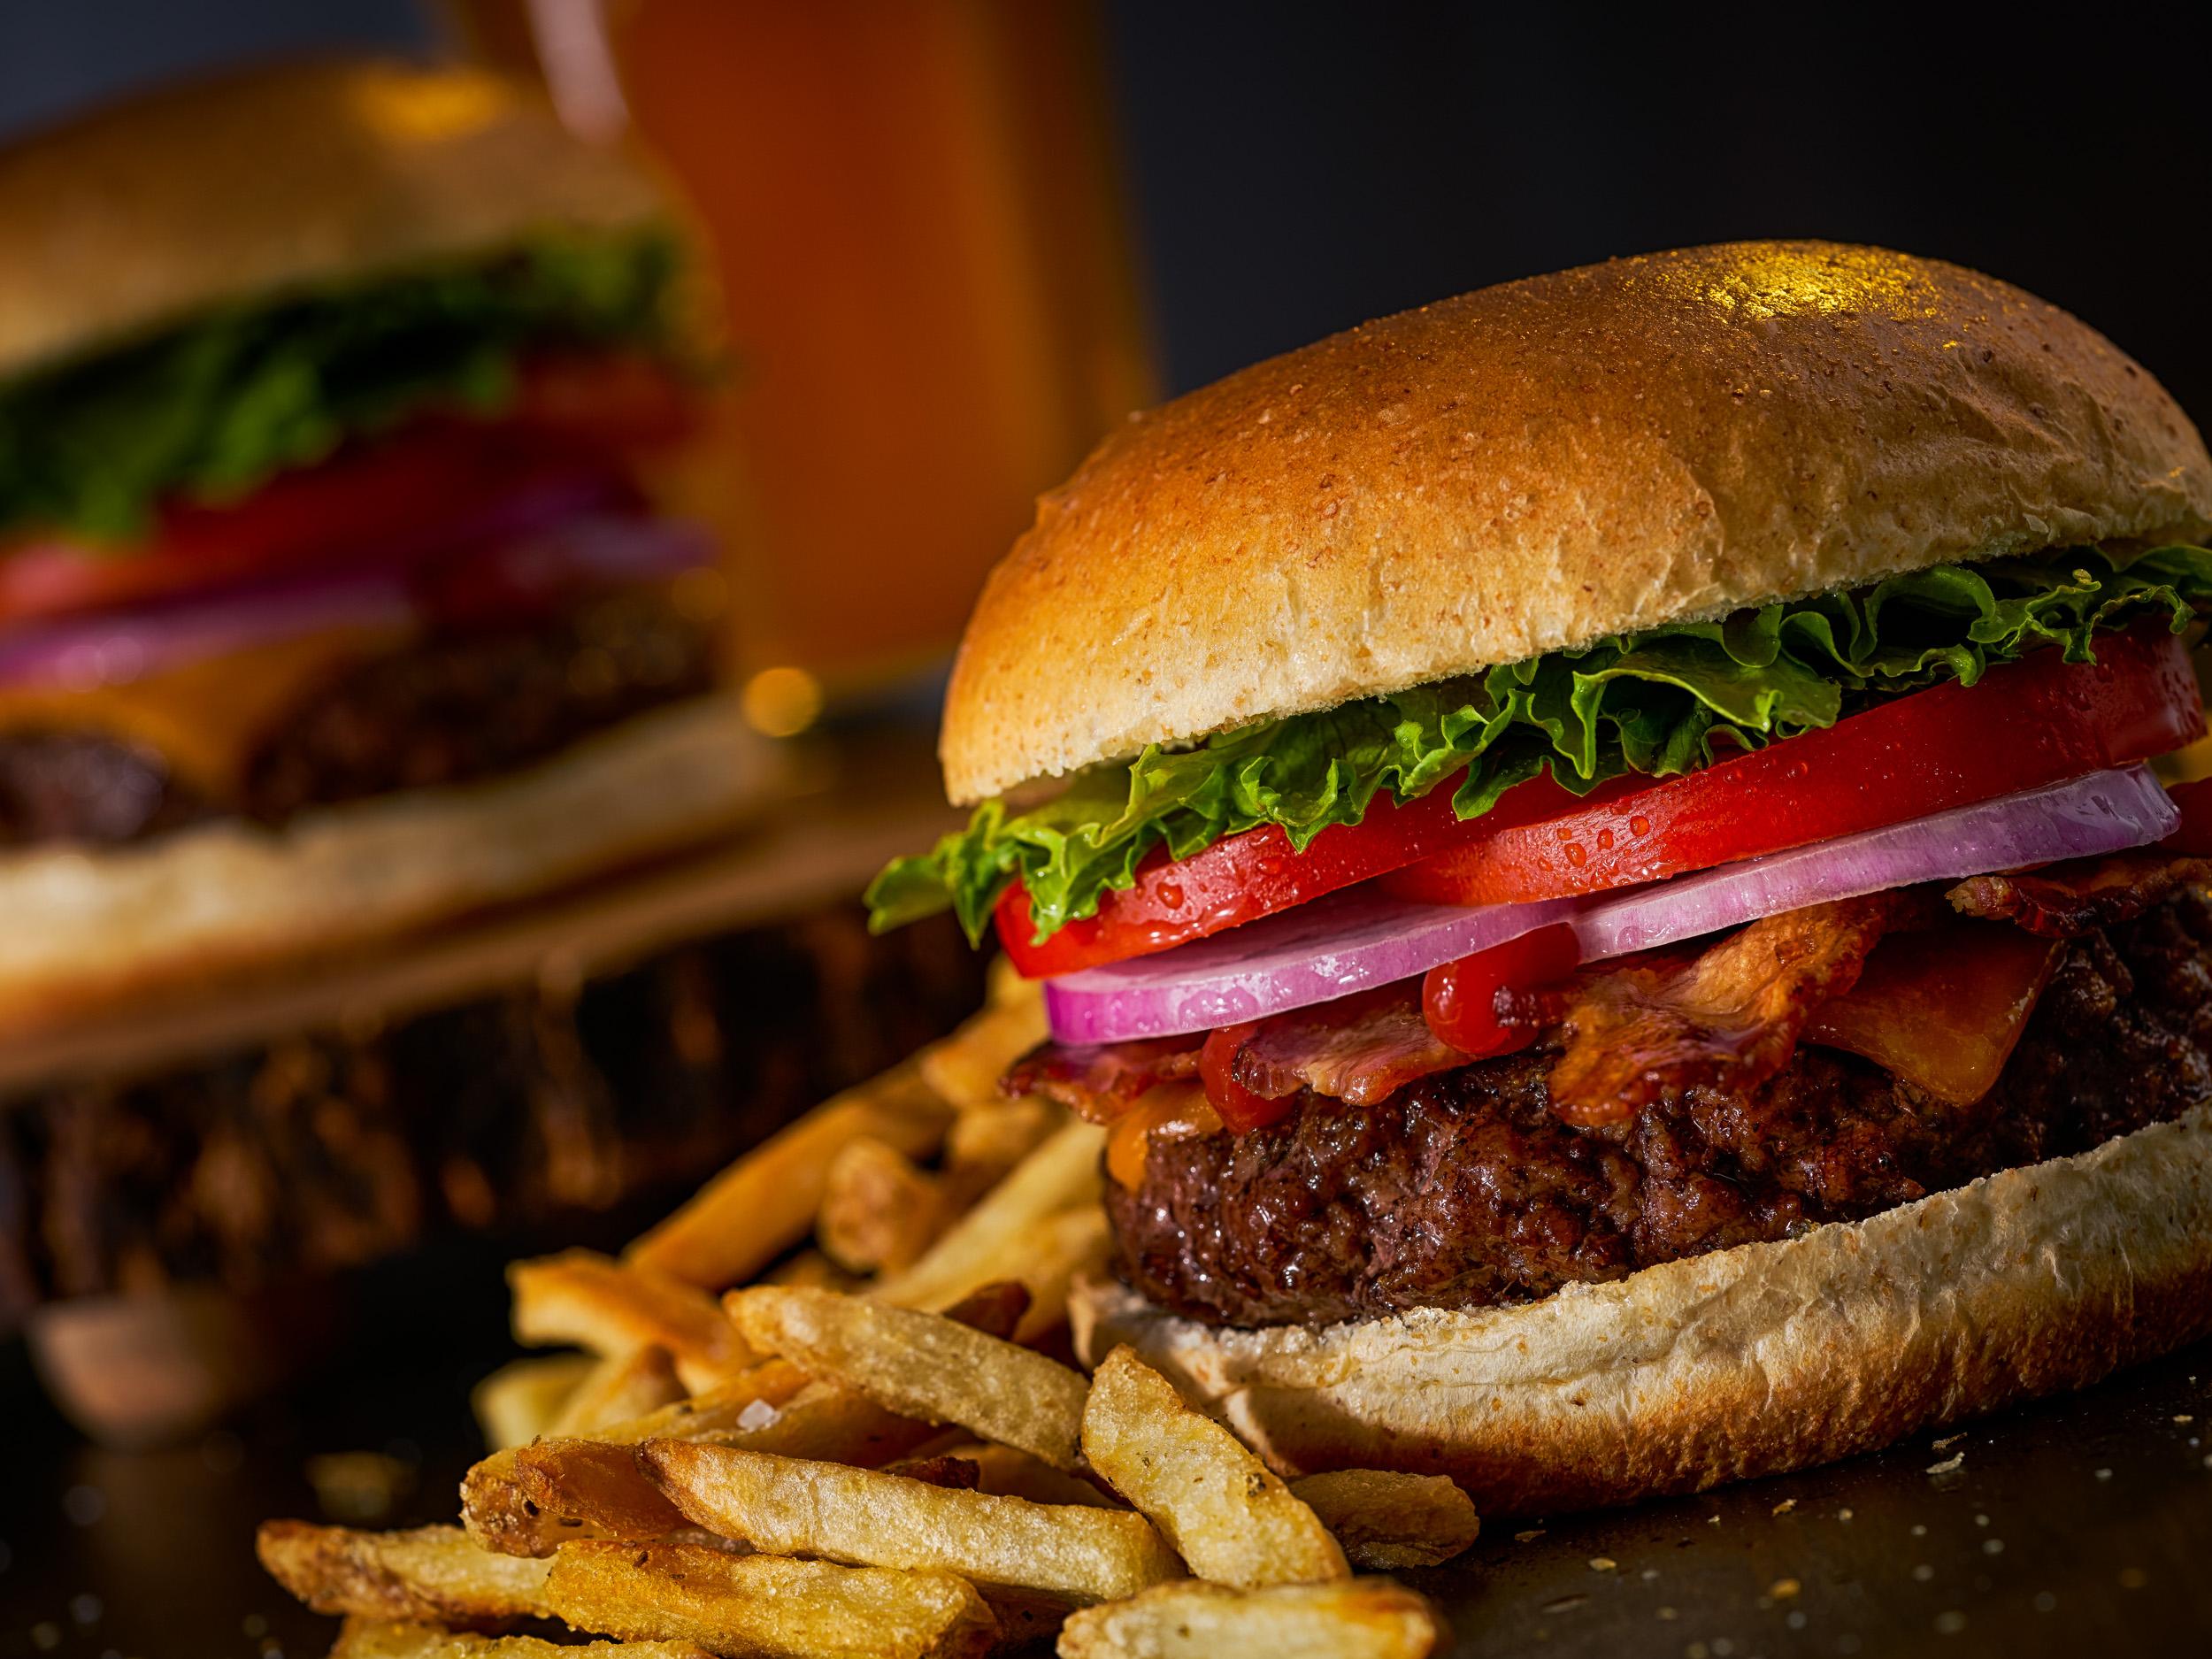 Cheeseburgers_Beer_Miami_food_photographer_Franklin_Castillo-Edit.jpg